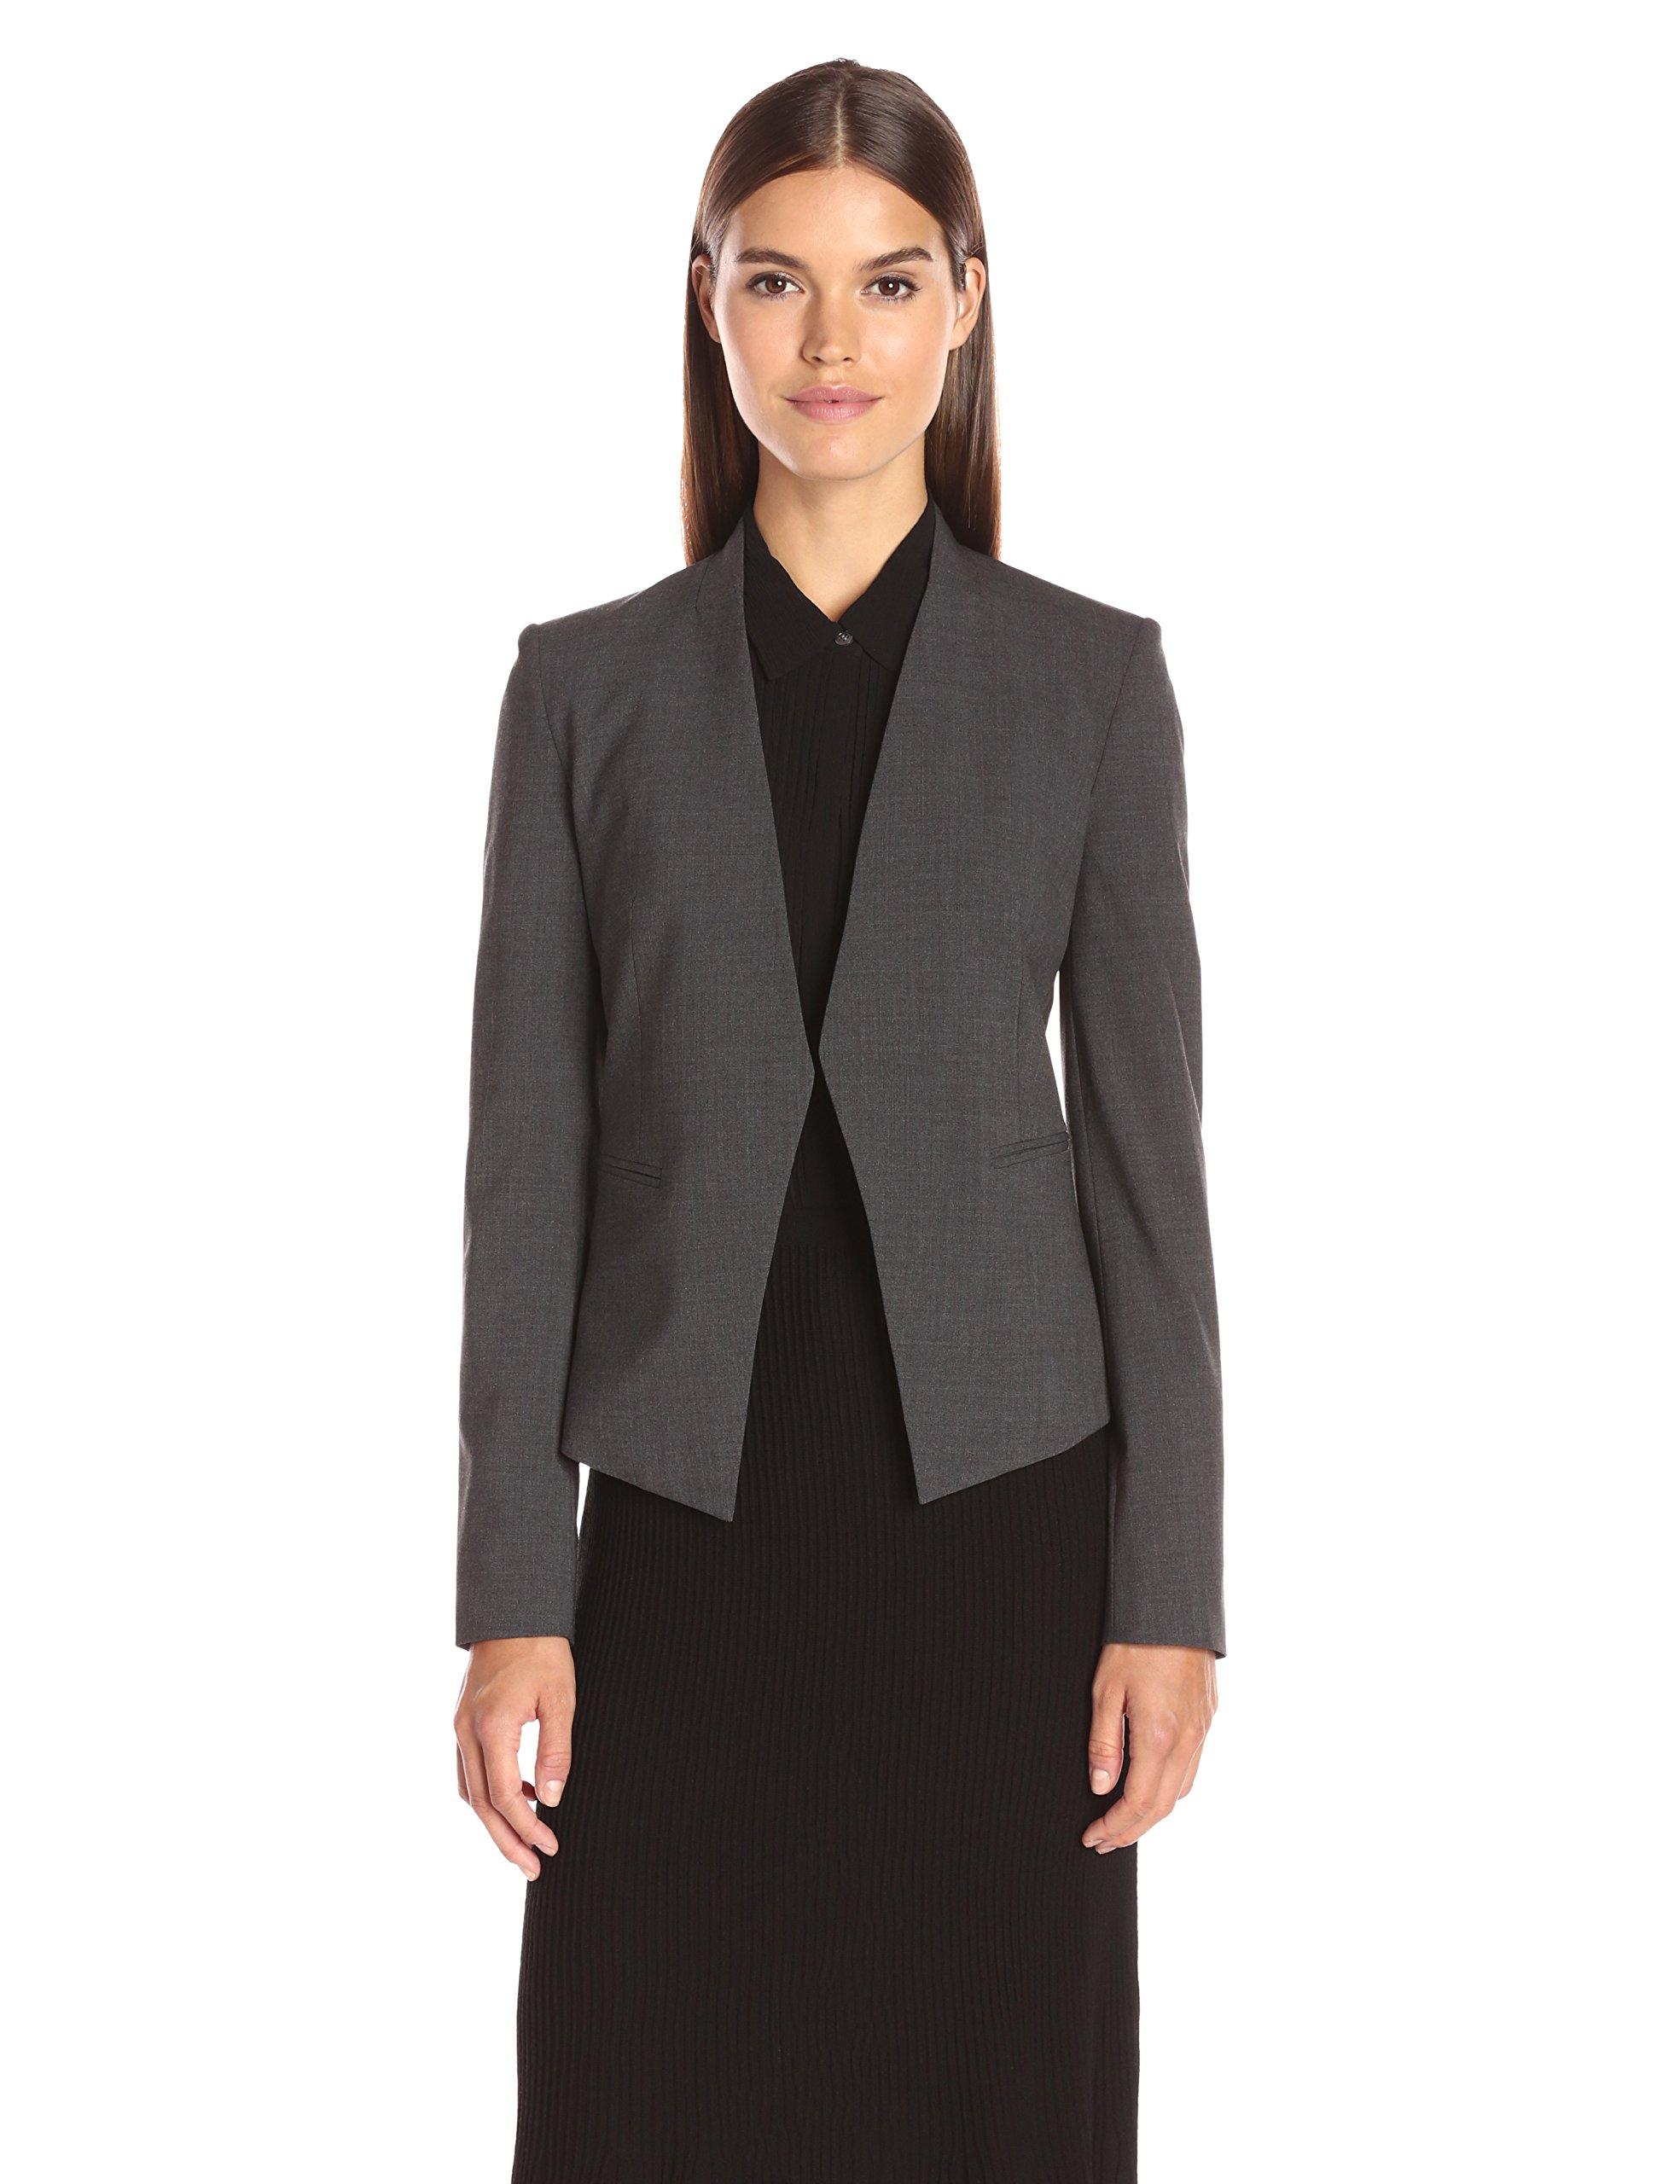 Theory Women's Lanai Edition 4 Jacket, Charcoal, 6